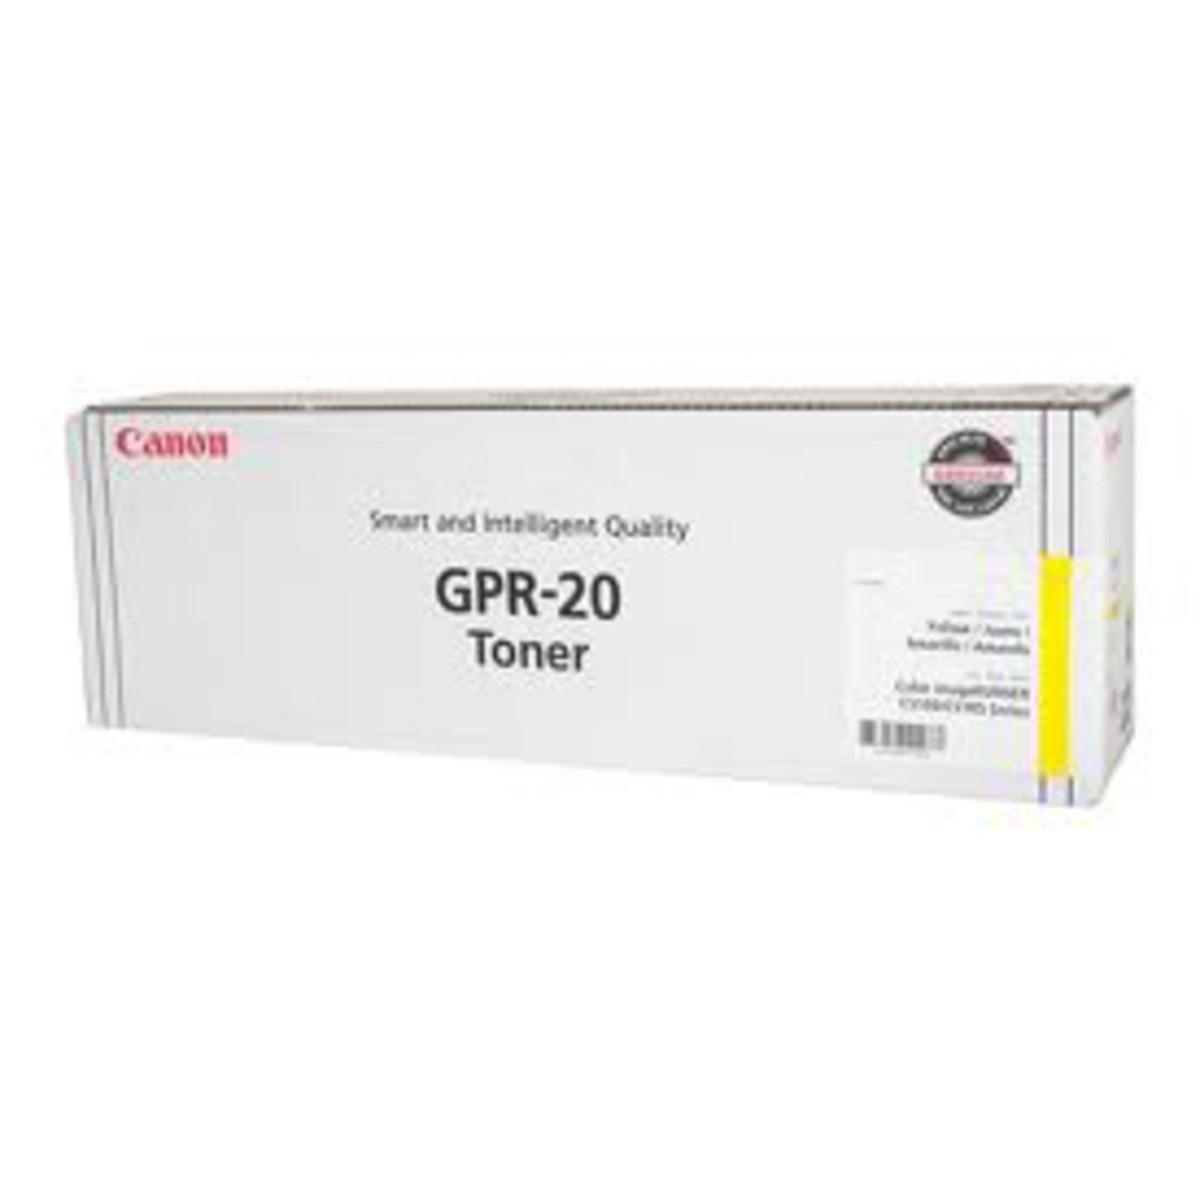 Canon GPR-20 Yellow Toner Cartridge